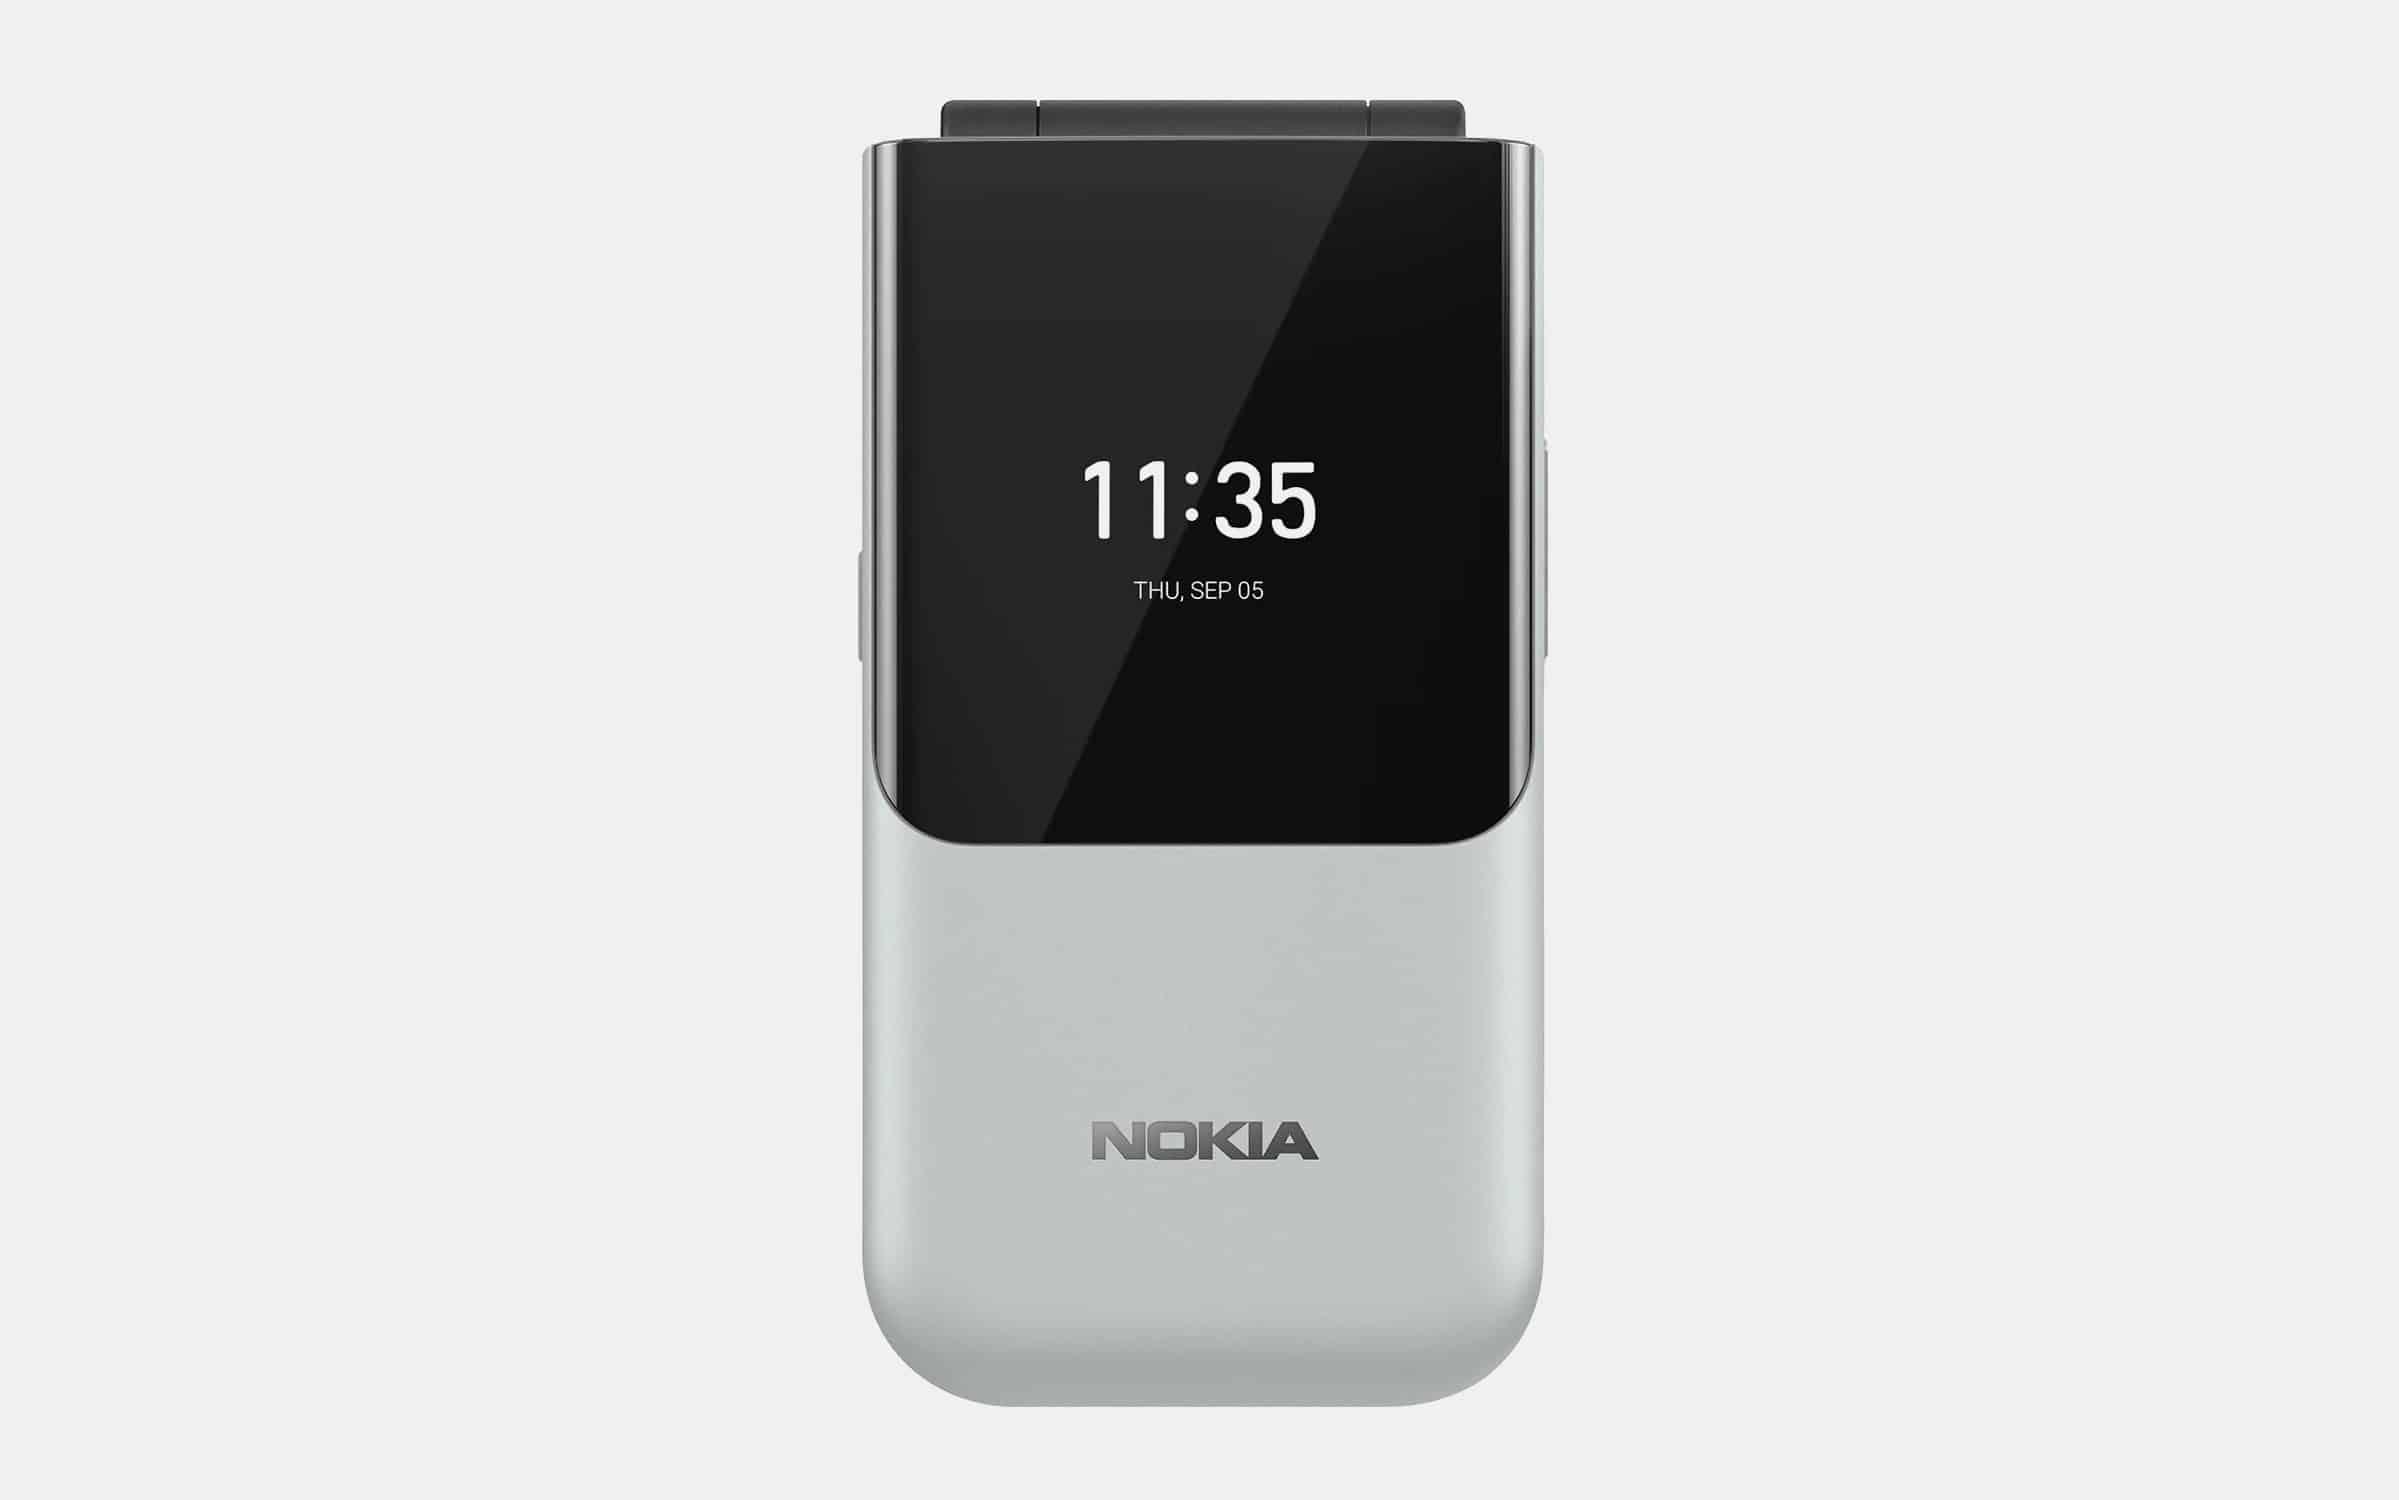 Nokia 2720 V Flip Phone